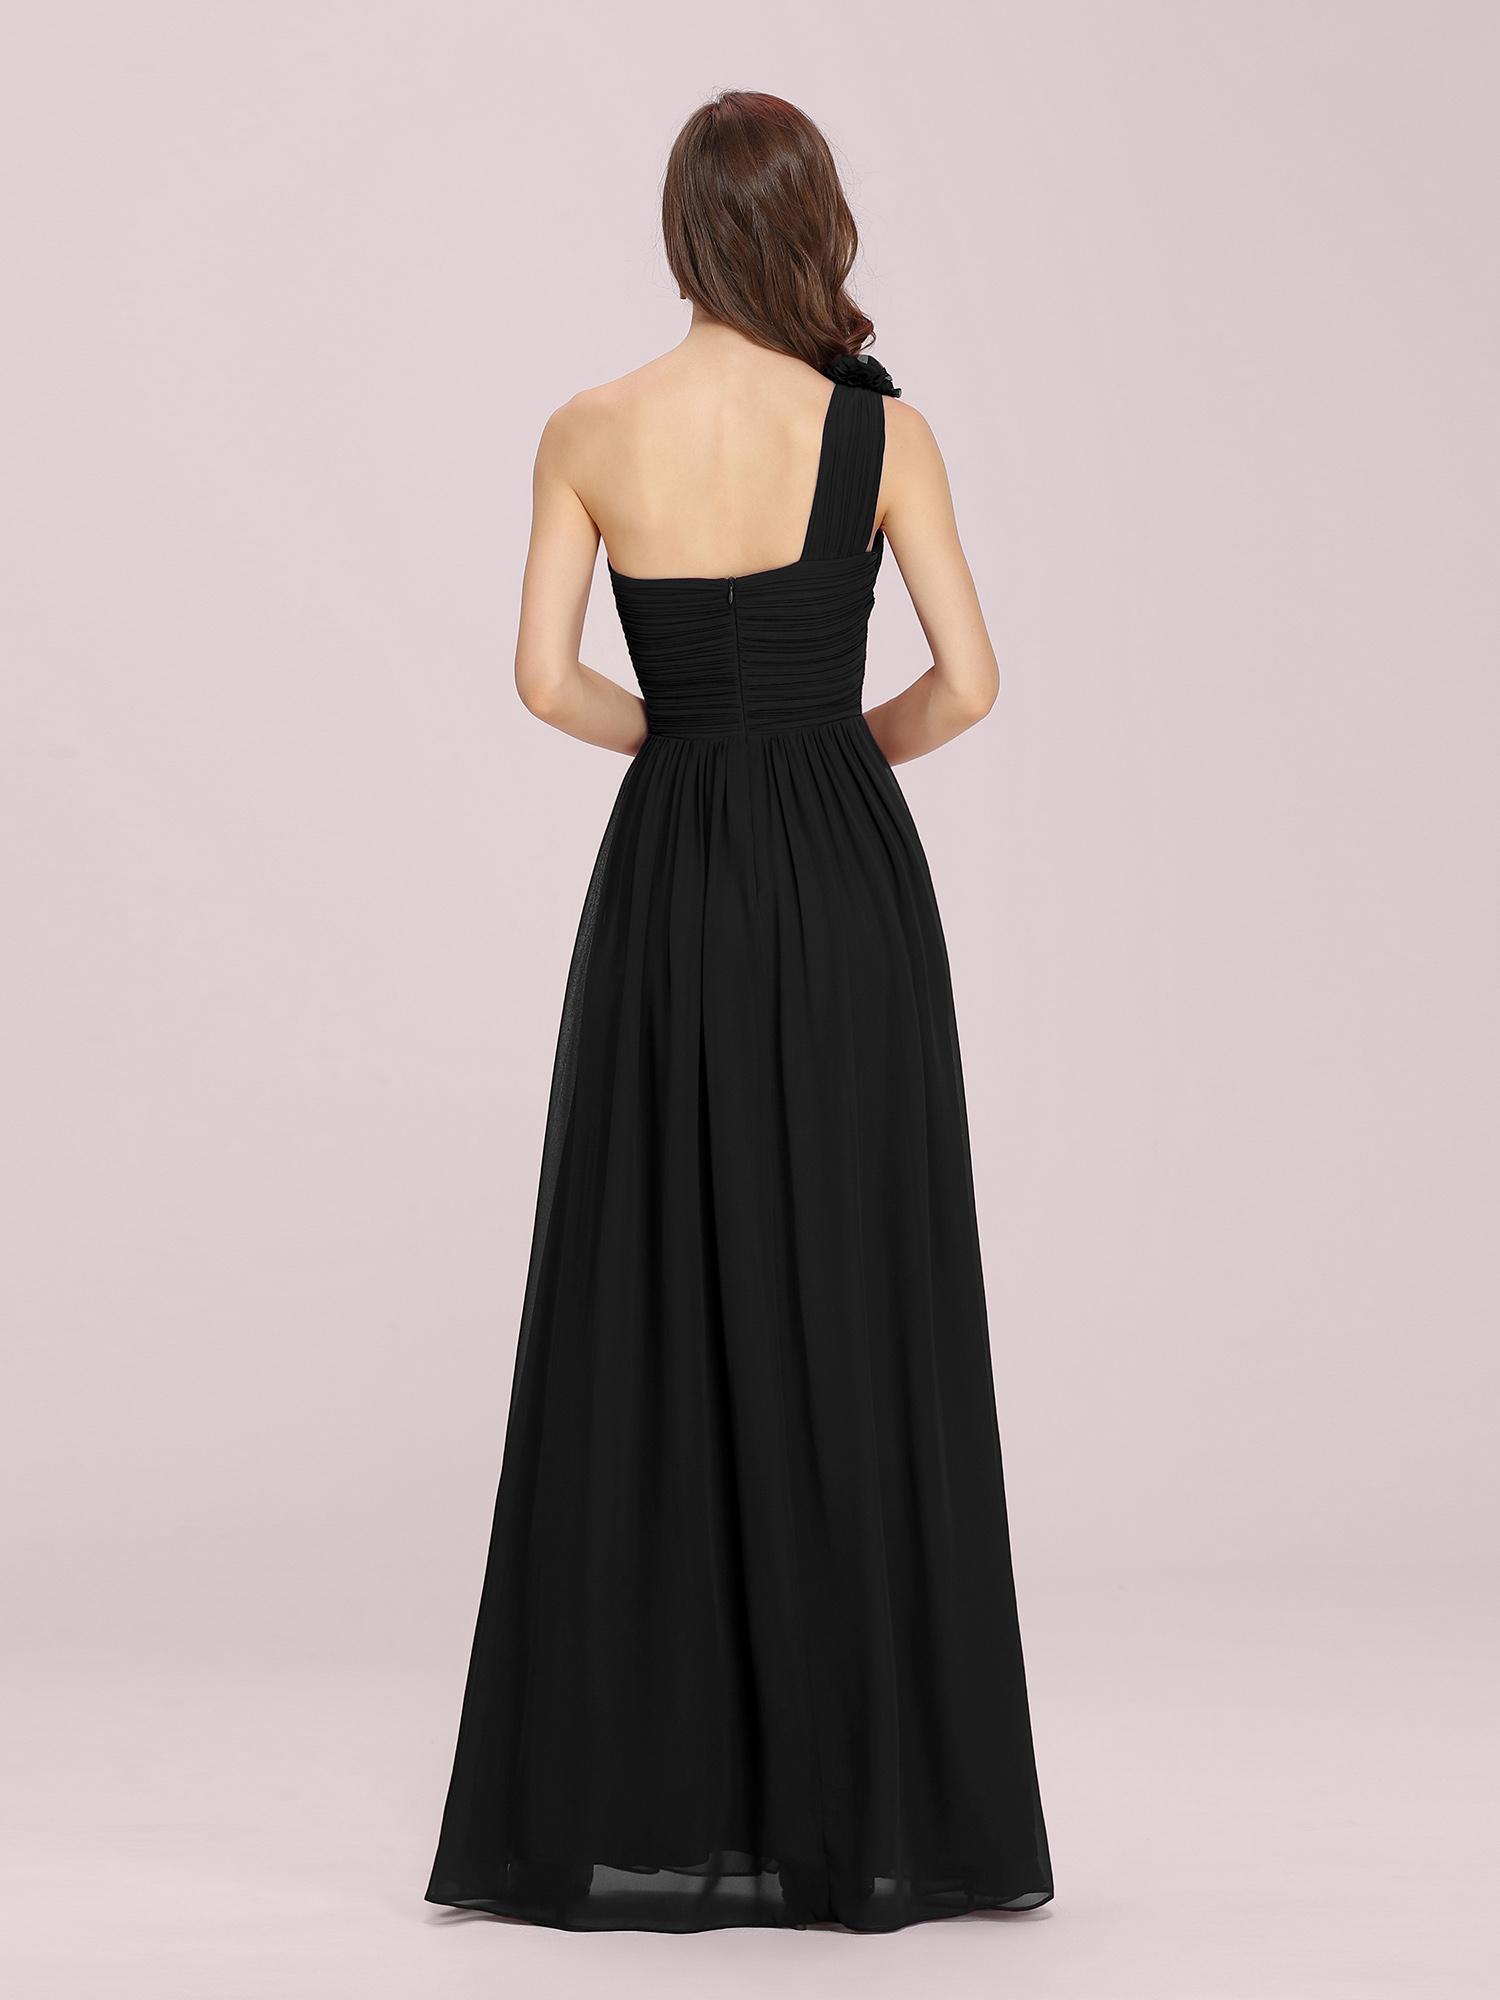 Ever-Pretty-US-Long-Bridesmaid-Dresses-One-Shoulder-Evening-Party-Dresses-08237 thumbnail 20